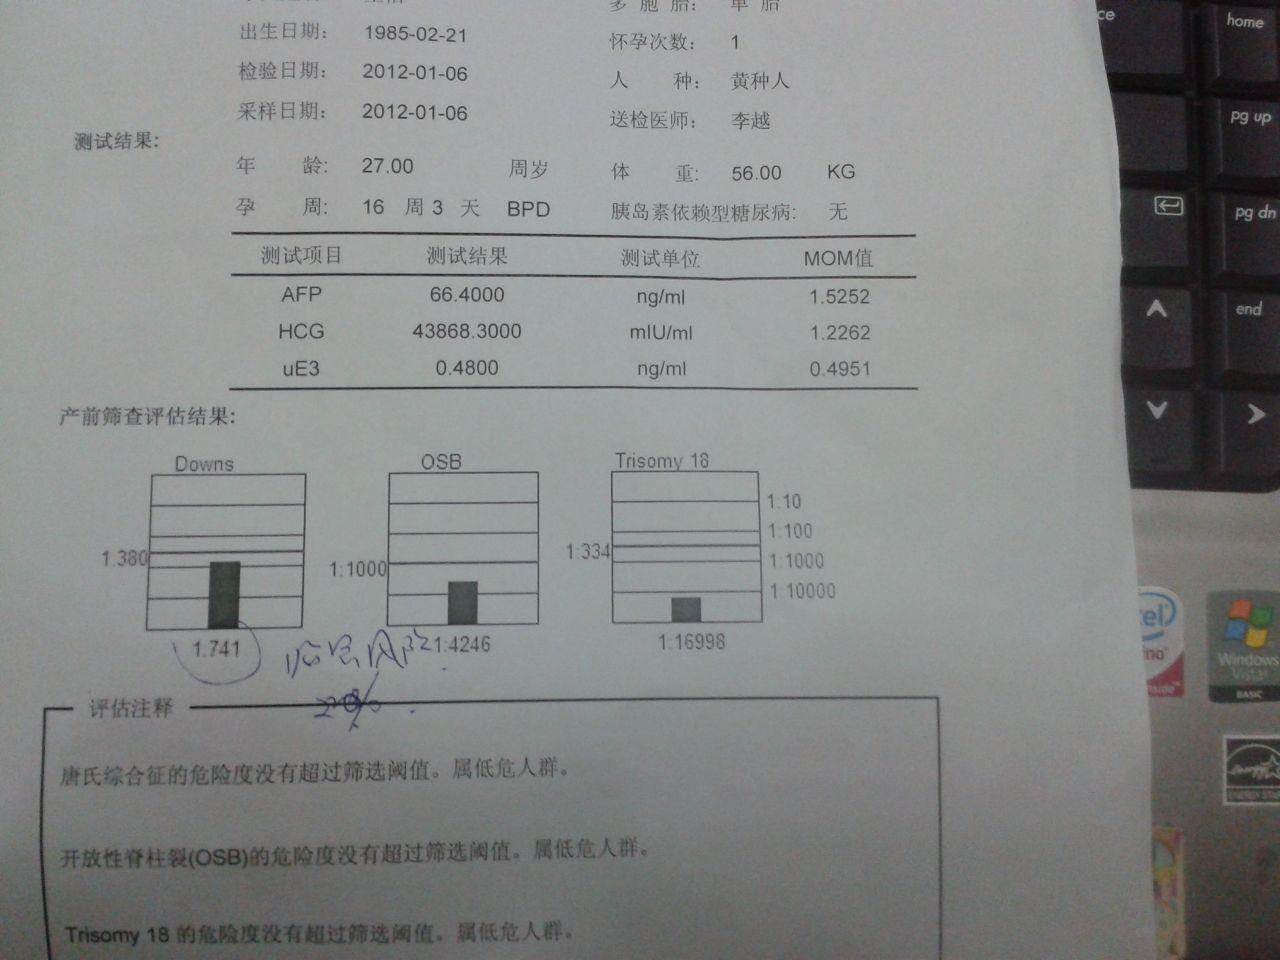 孕妇afp是什么意思_孕妇27周岁 孕周16 3天 体重56kg afp mom值1.5252 hcg mom值1.